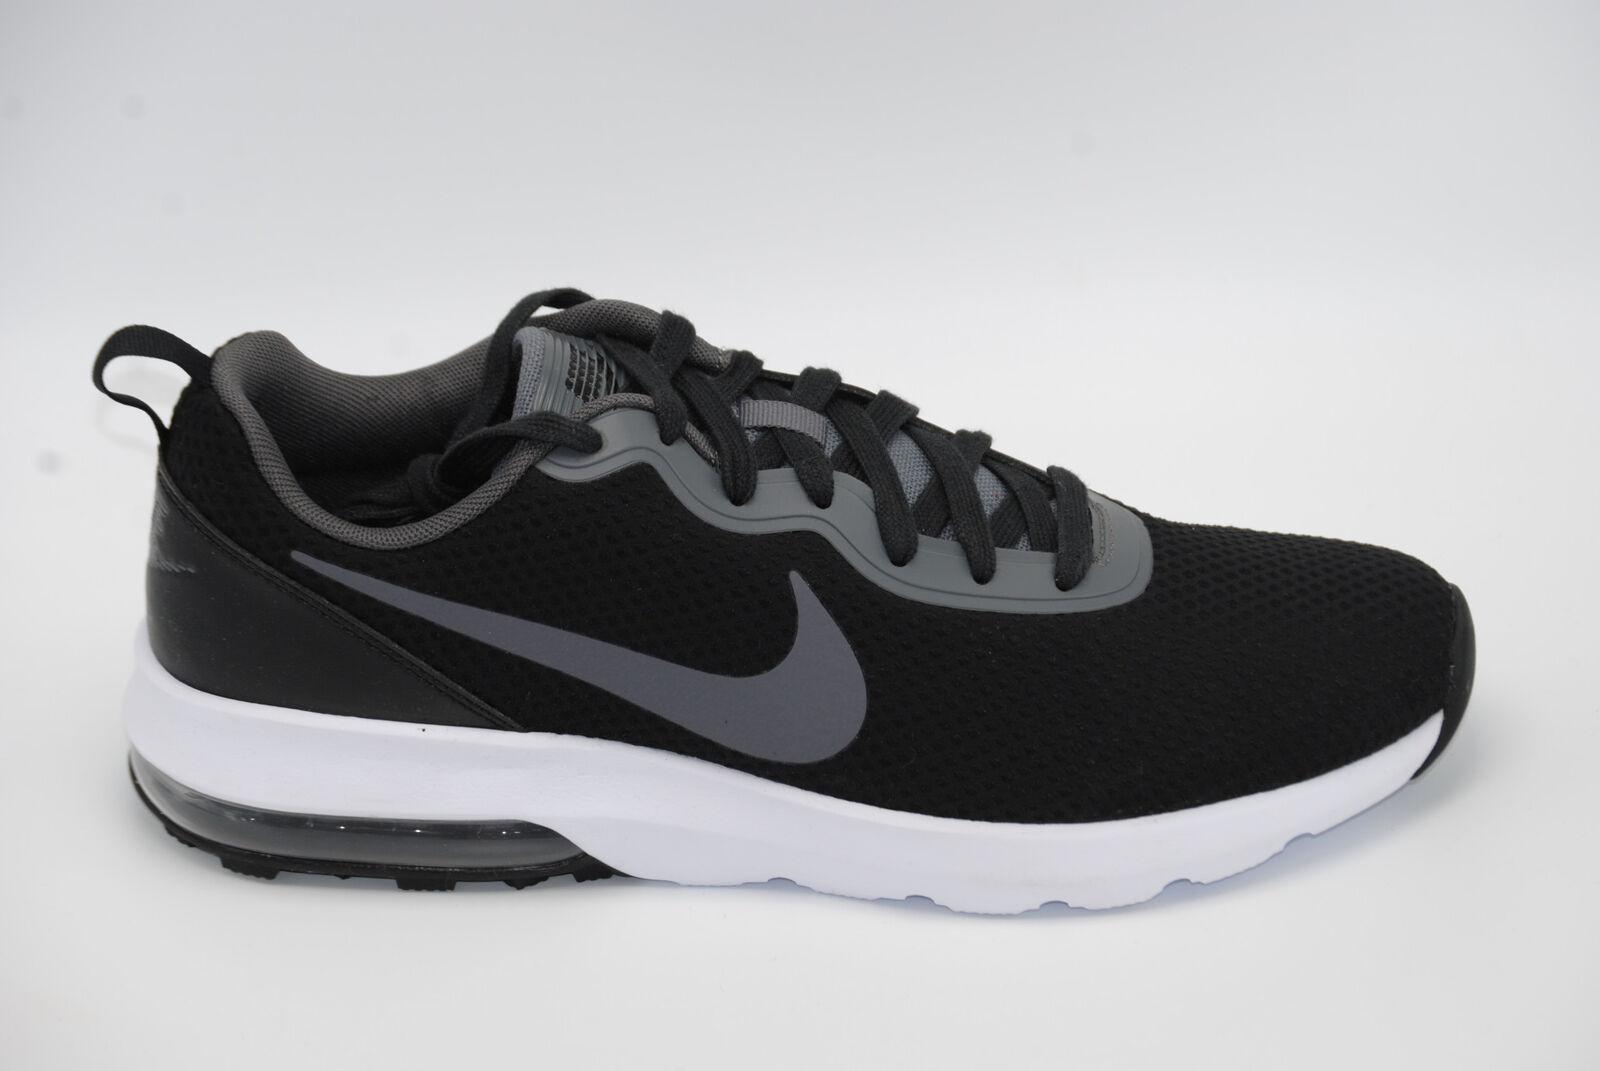 Nike Air Max Turbulence LS Men's sneakers 827177 003 Multiple Multiple Multiple sizes bea8a9